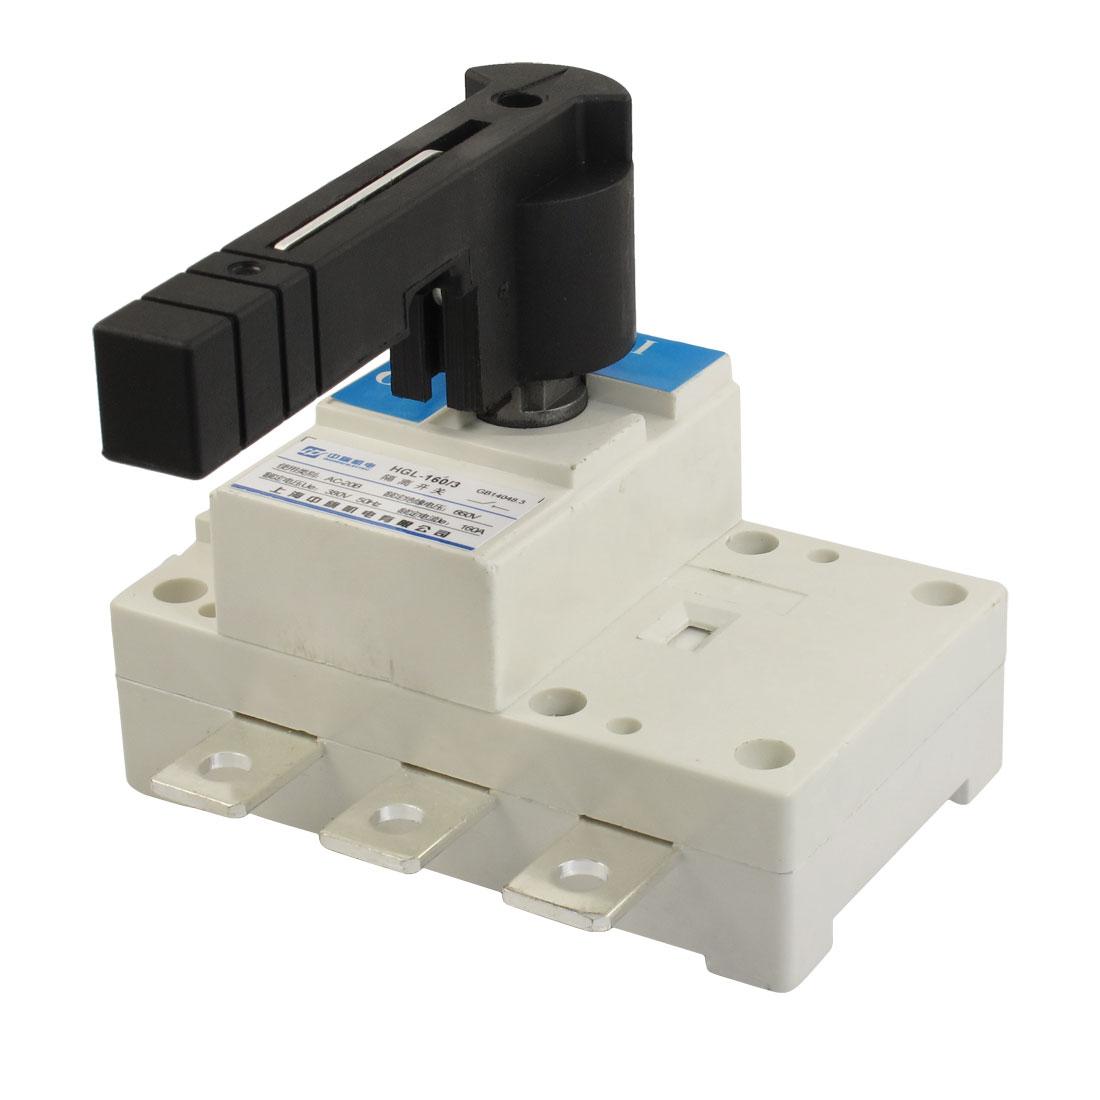 AC-380V-50Hz-160A-2P-E-660V-Ui-Electronic-Corcuit-Isolating-Switch